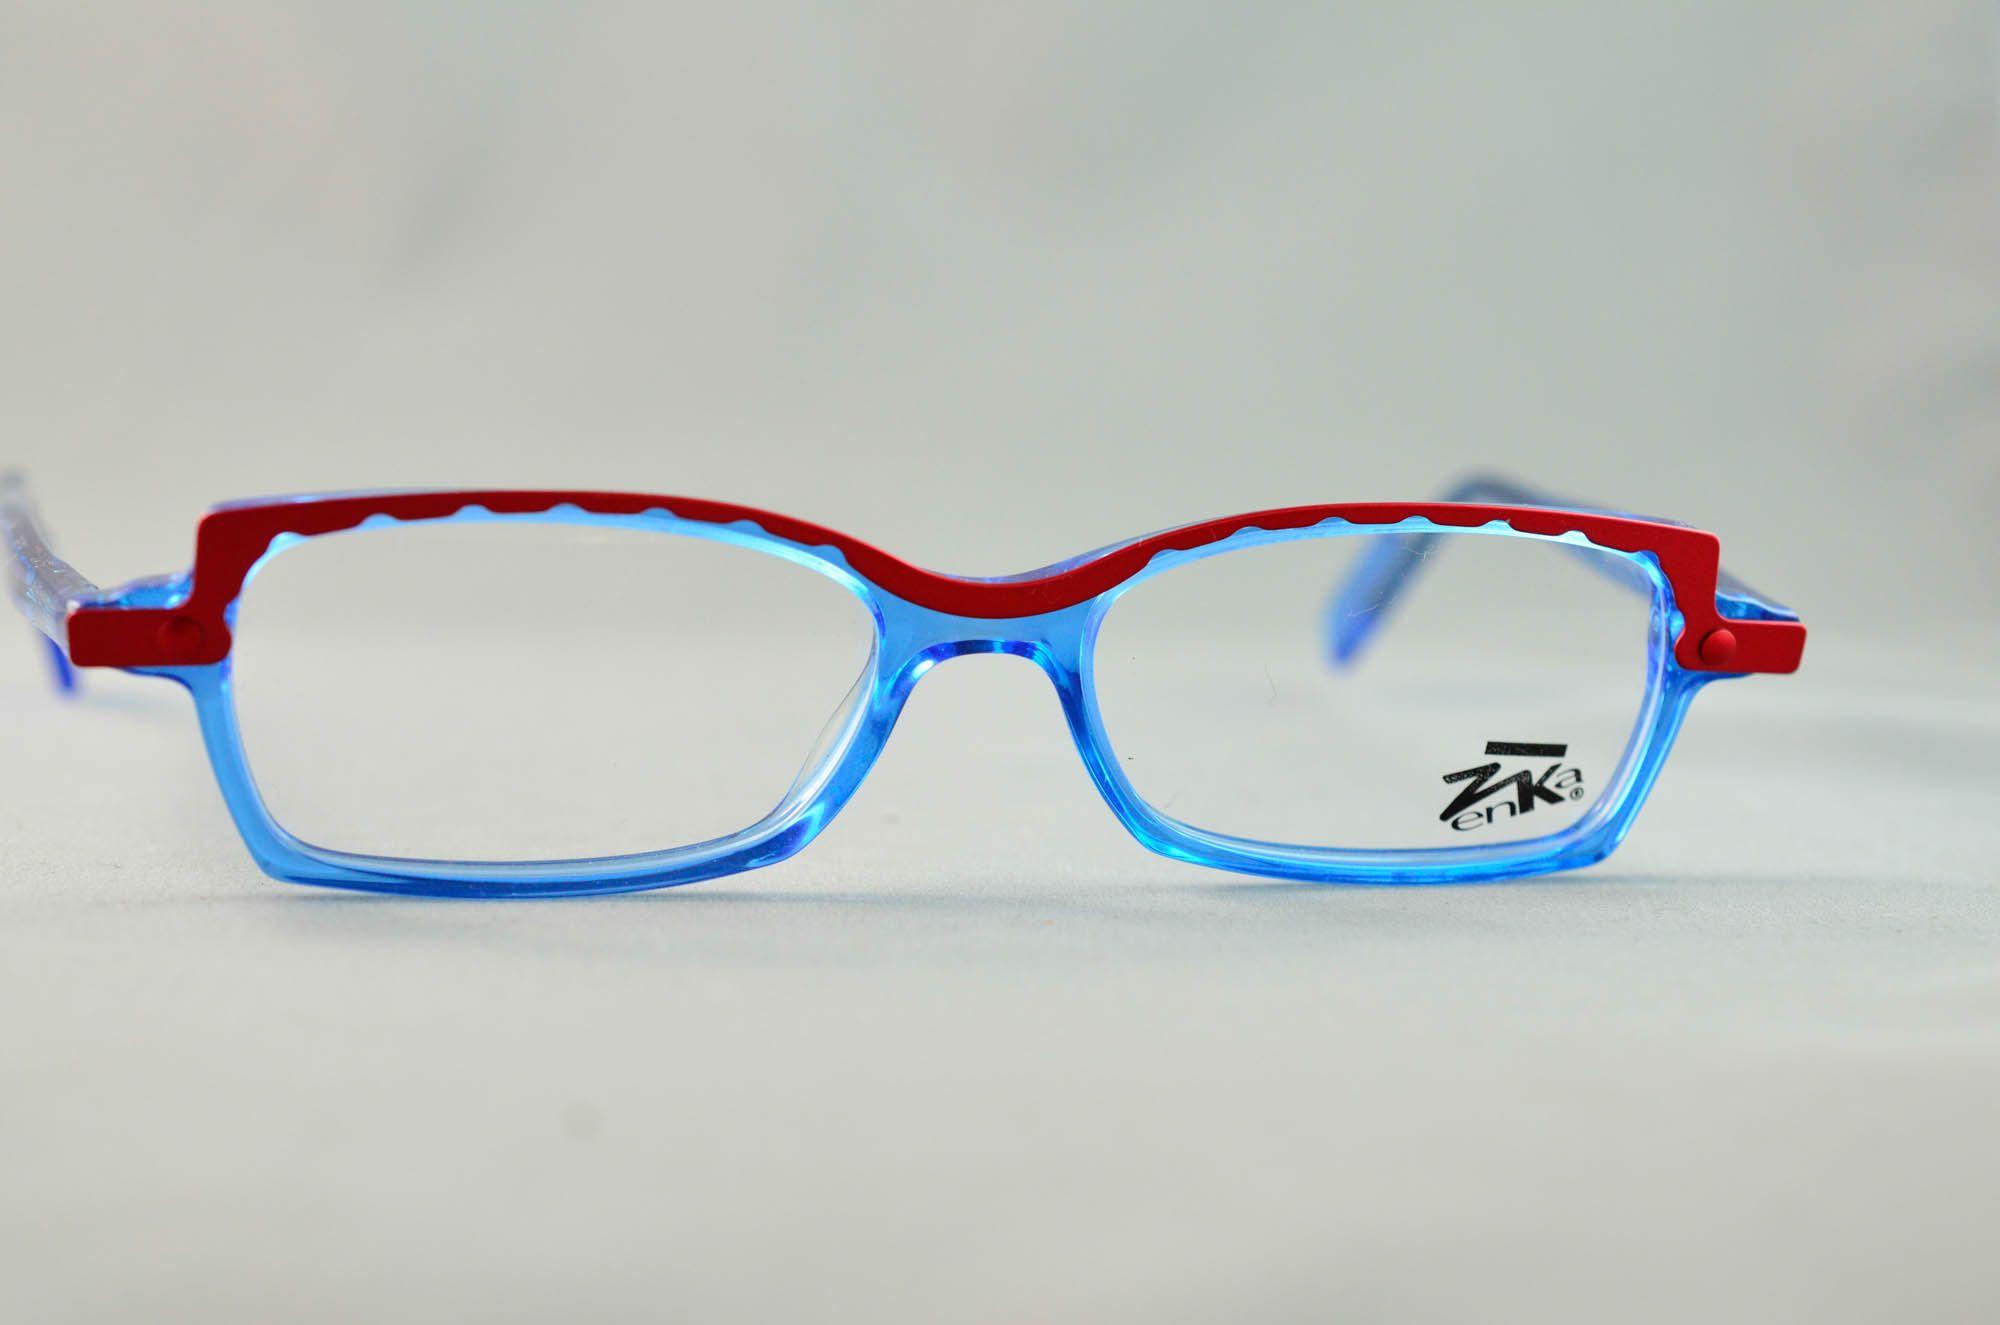 Zenka Frames Mixi 1b Shape Rectangle Material Acetate Made 1db36ba60843